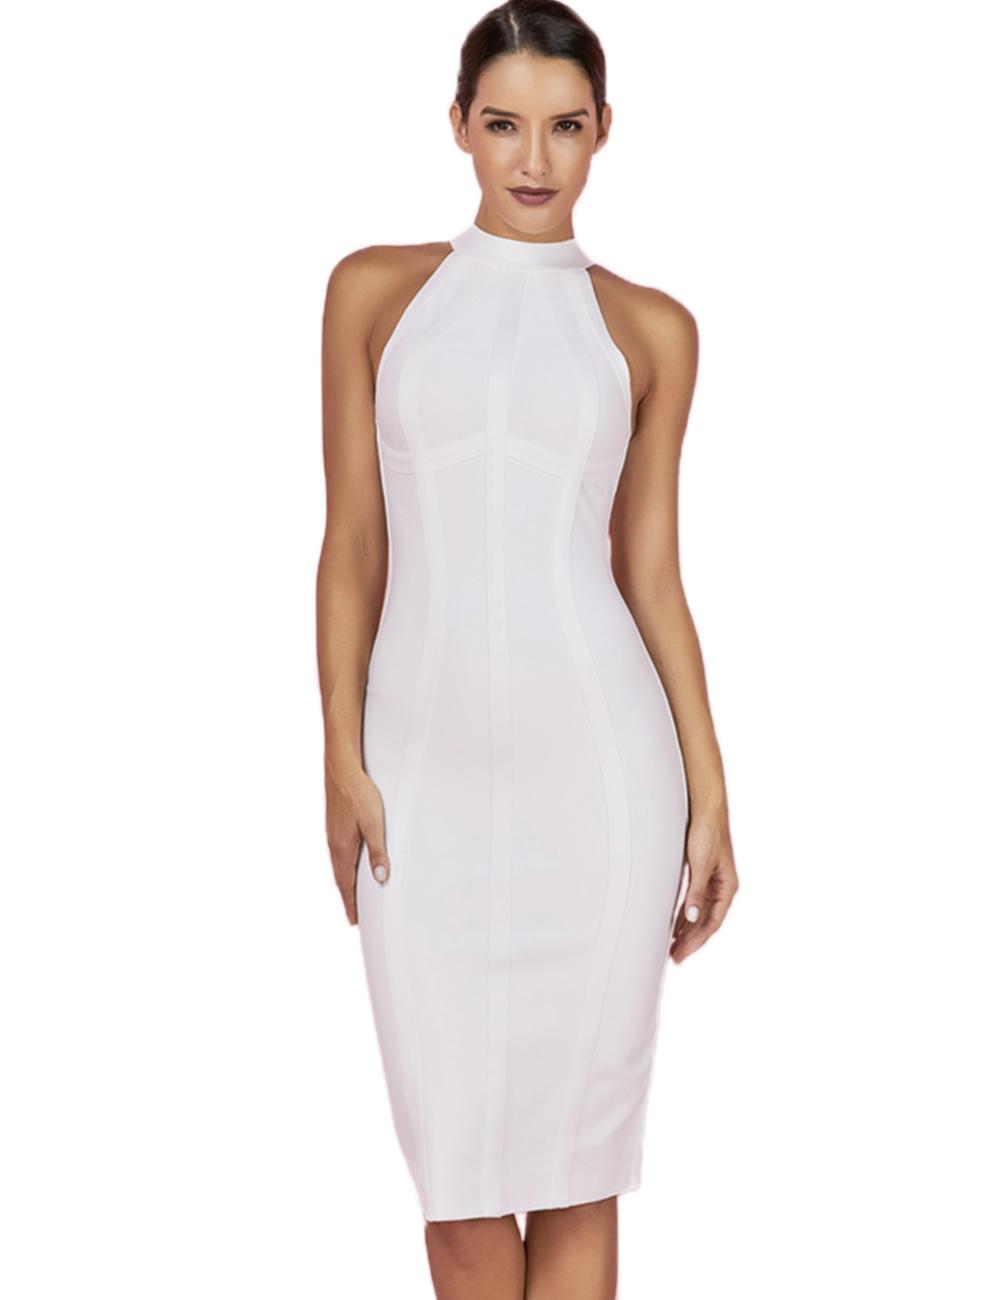 Maketina Women's High Neck Sleeveless Striped Bodycon Midi Cocktail Party Bandage Dress